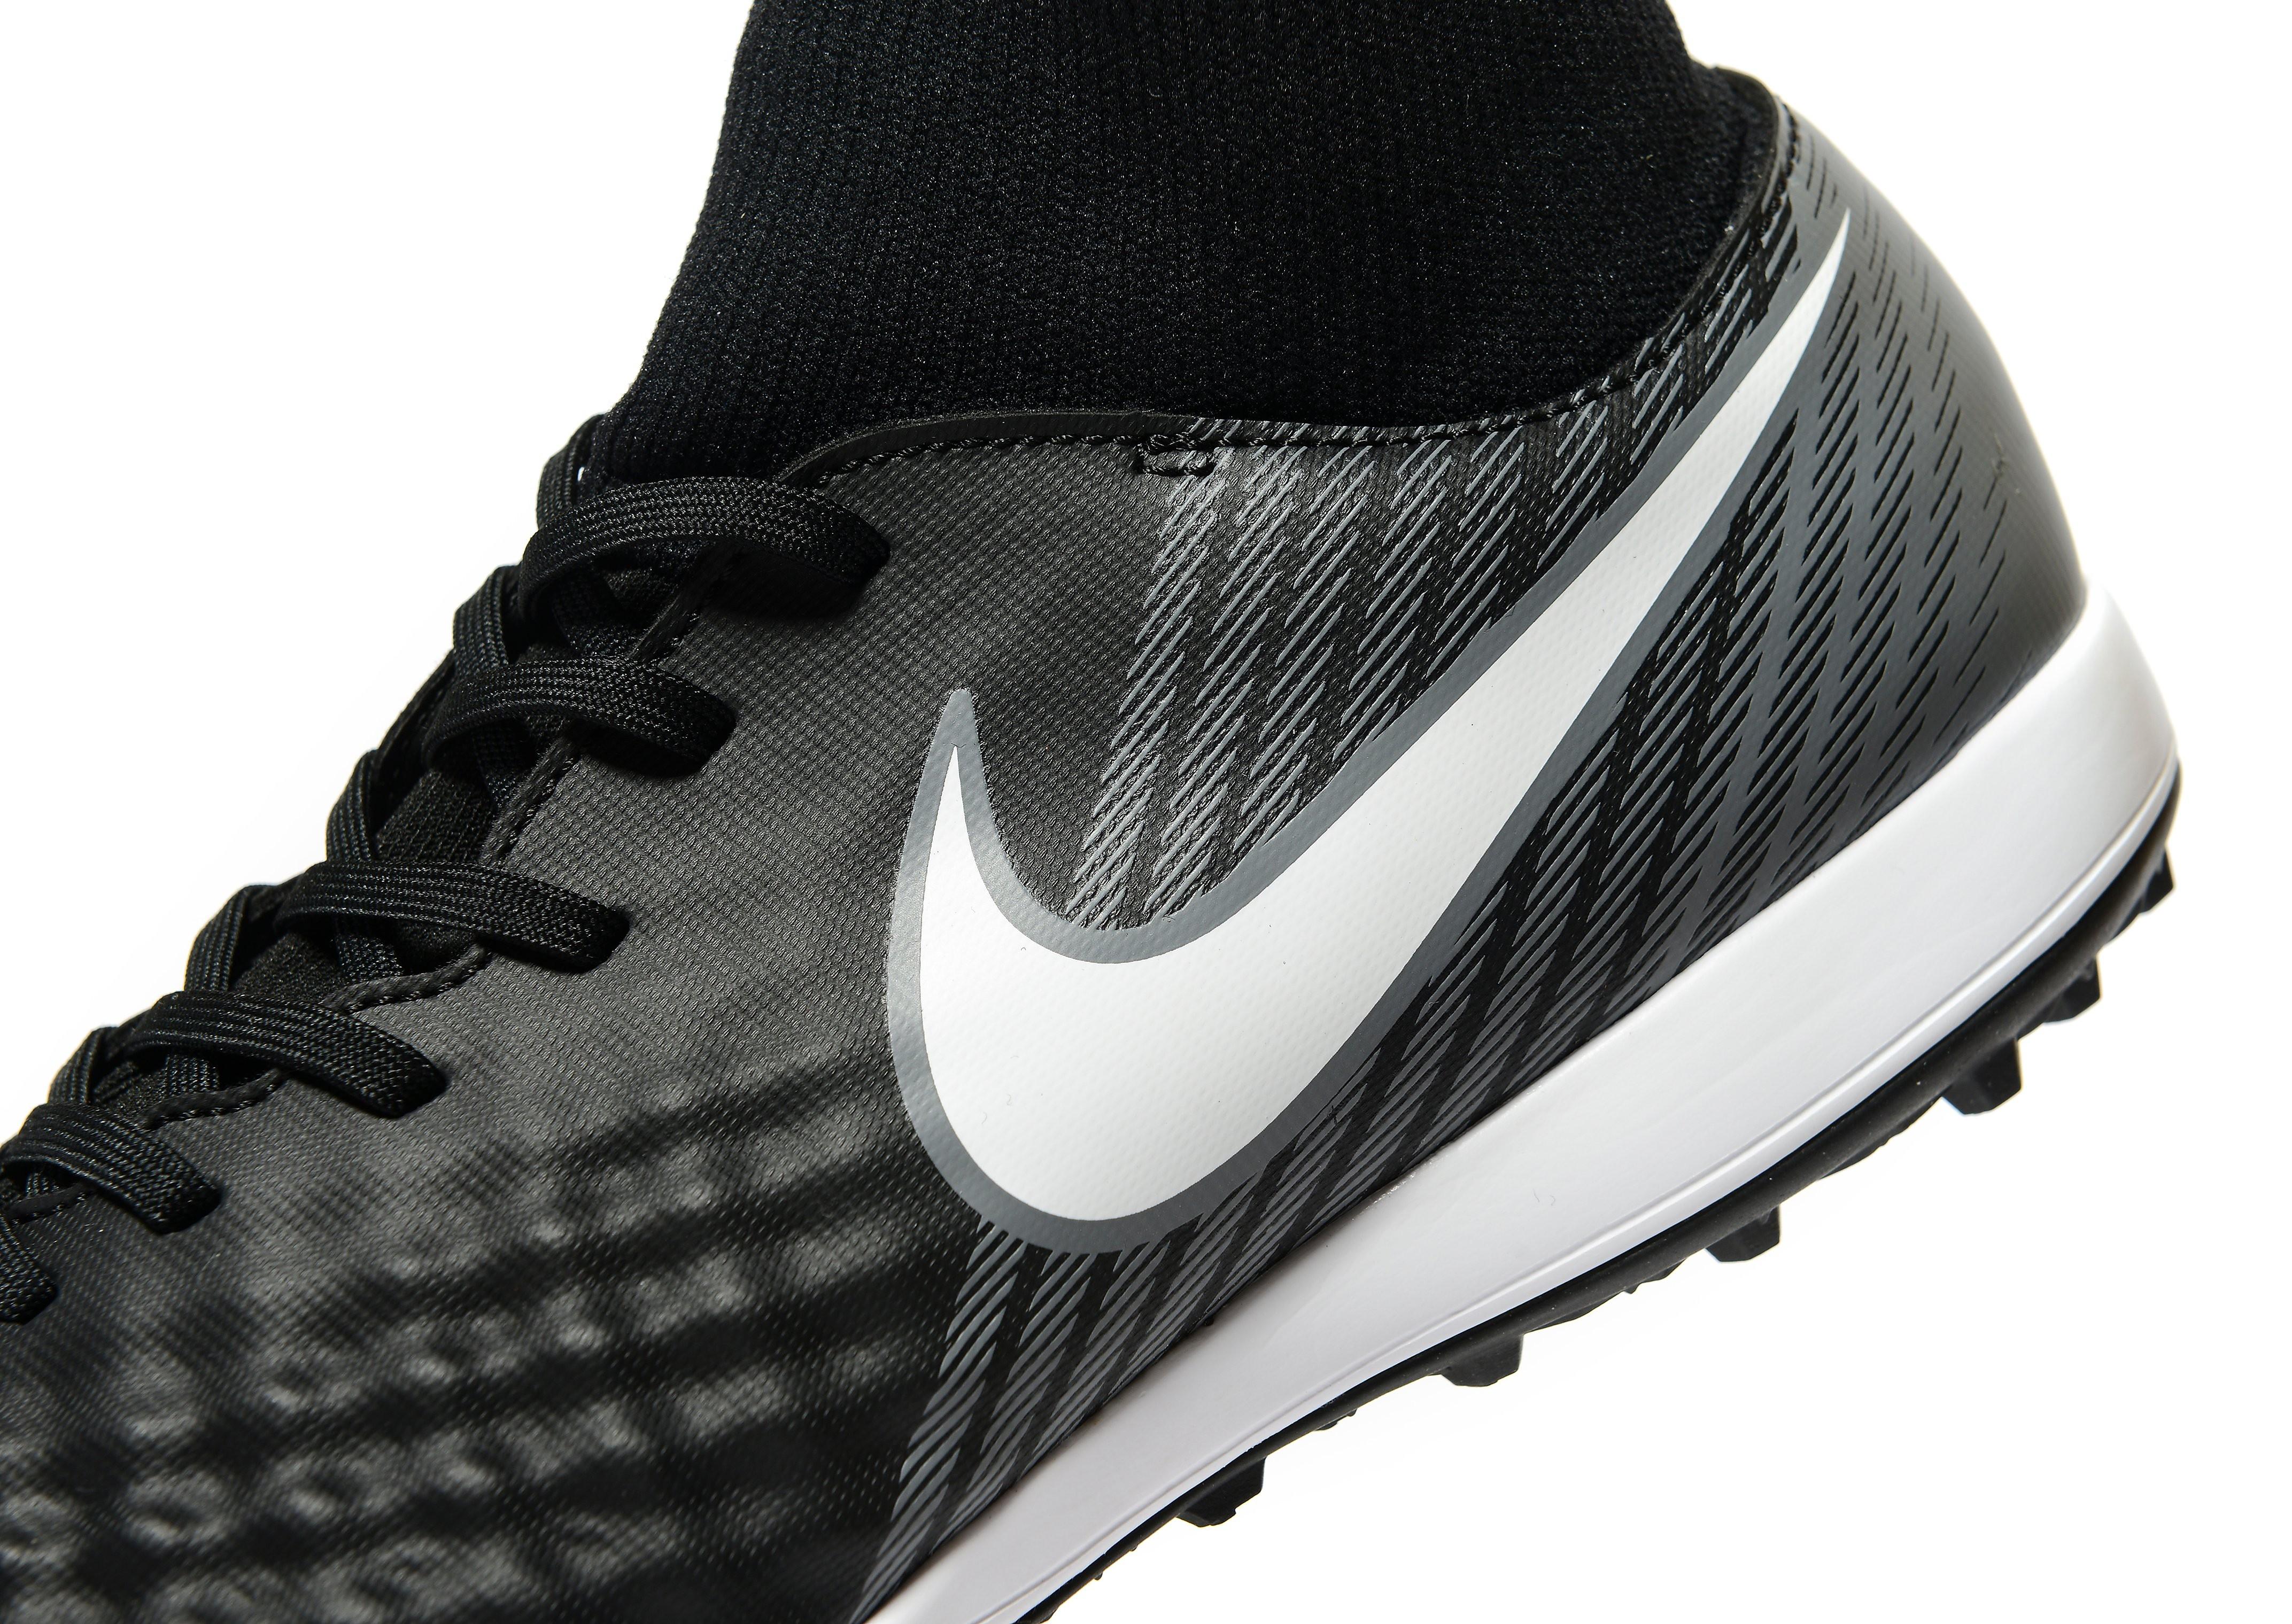 Nike Motion Blur Magista Onda Astro Turf